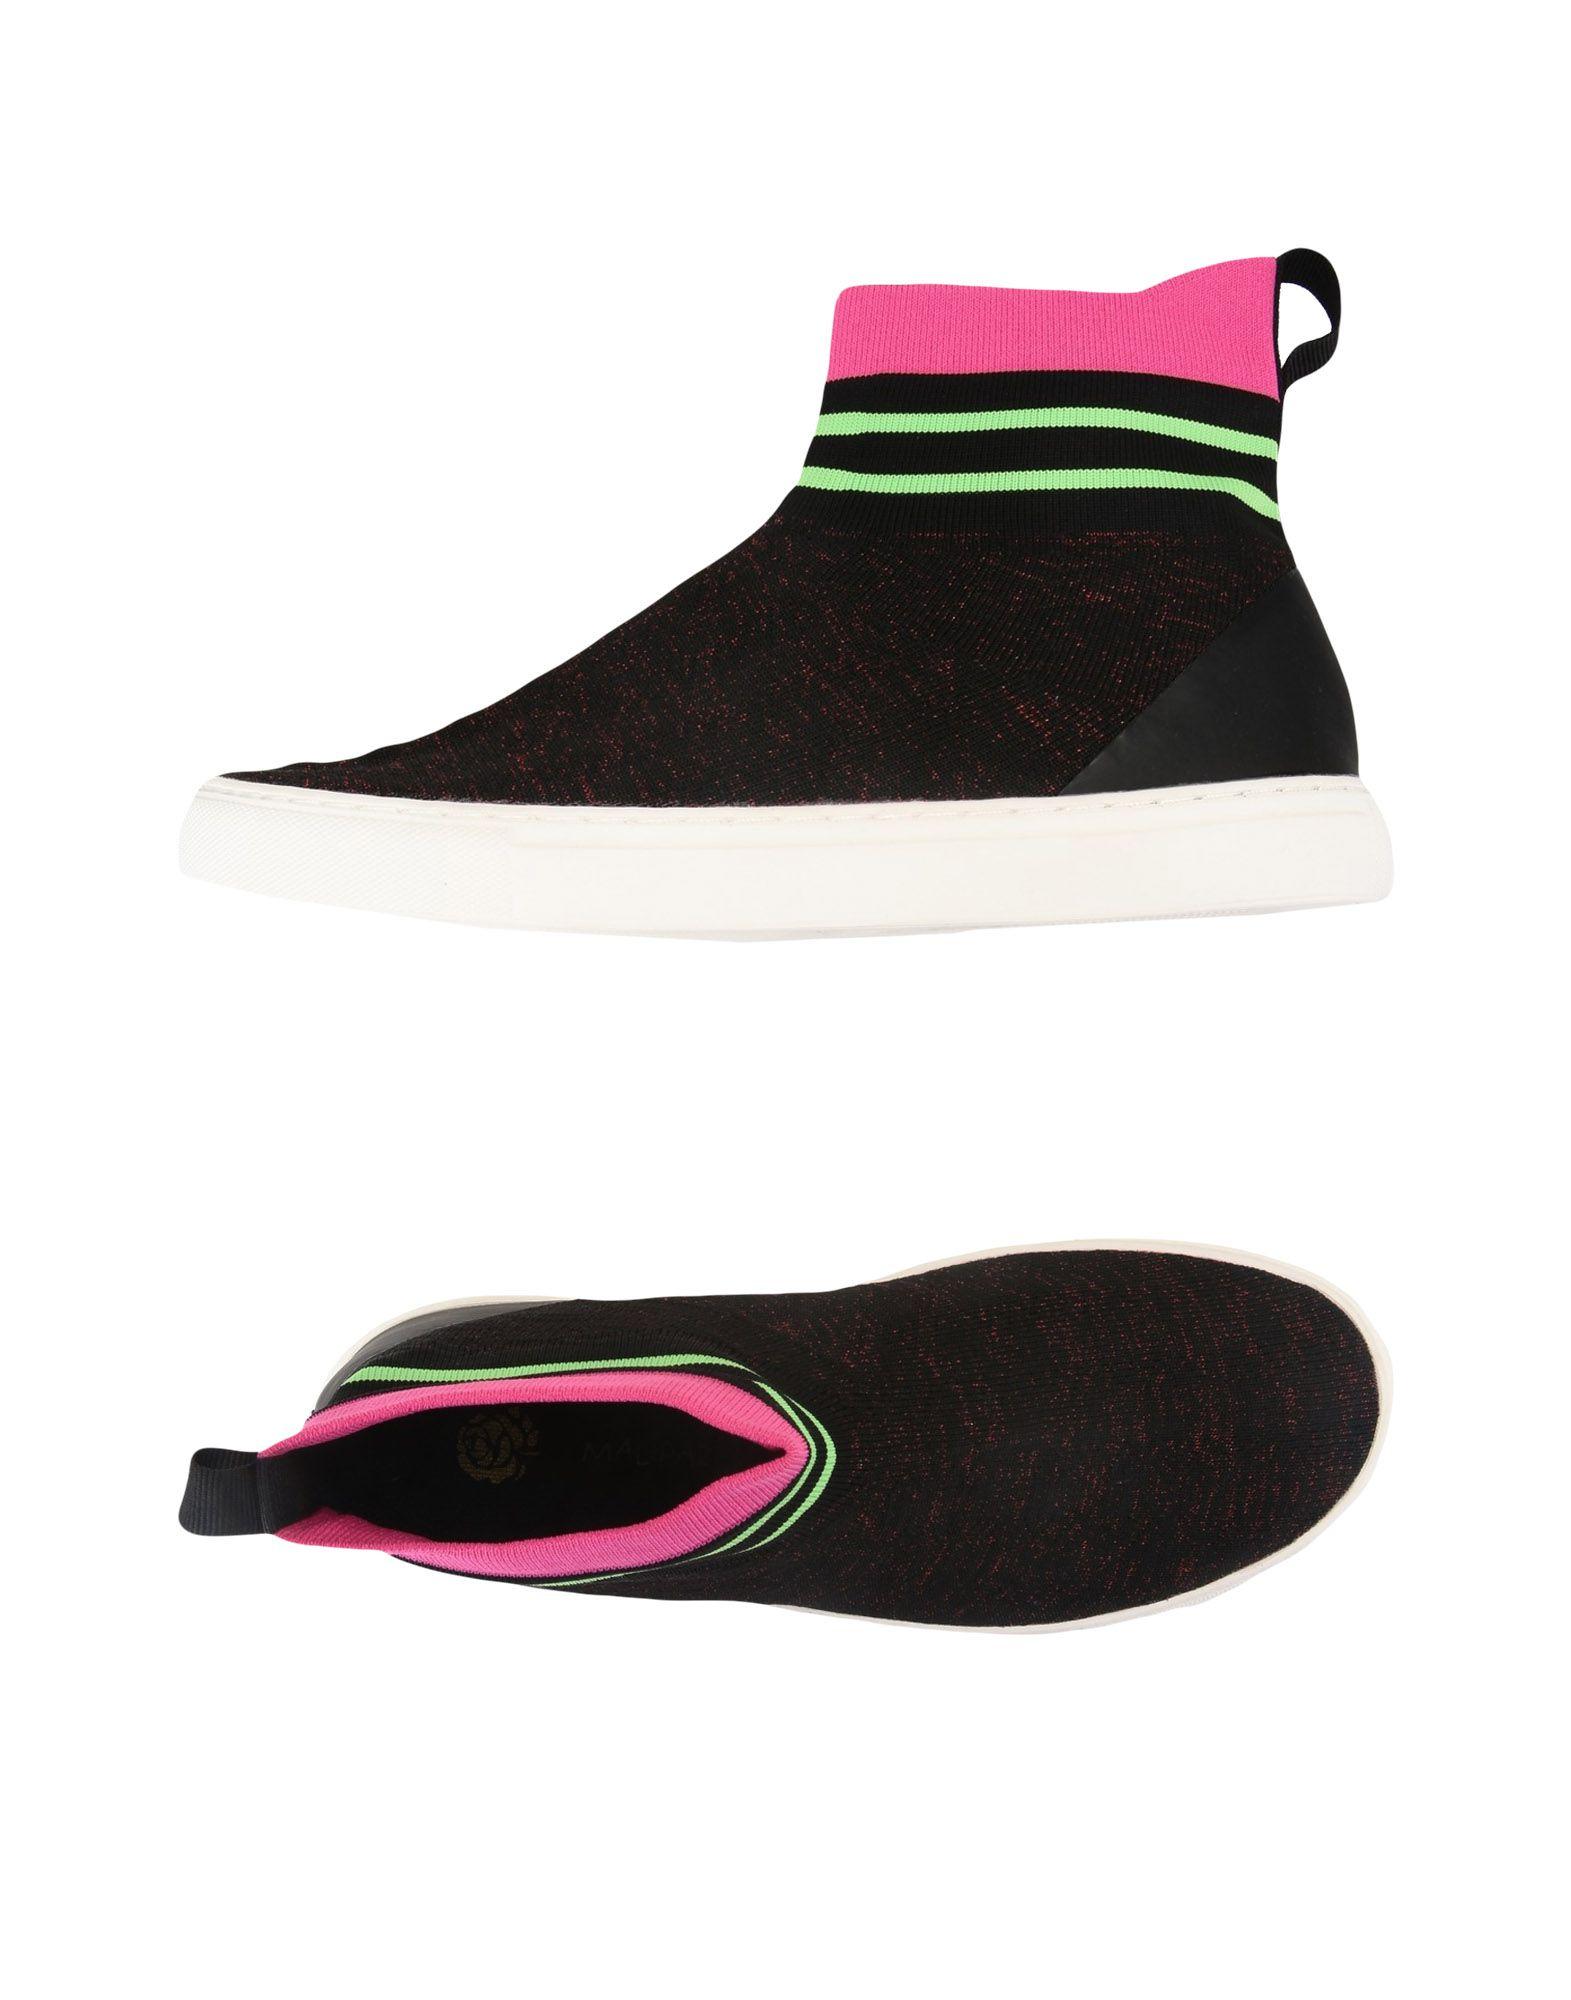 Malìparmi Sneakers Damen beliebte  11474864BP Gute Qualität beliebte Damen Schuhe 5b15c8